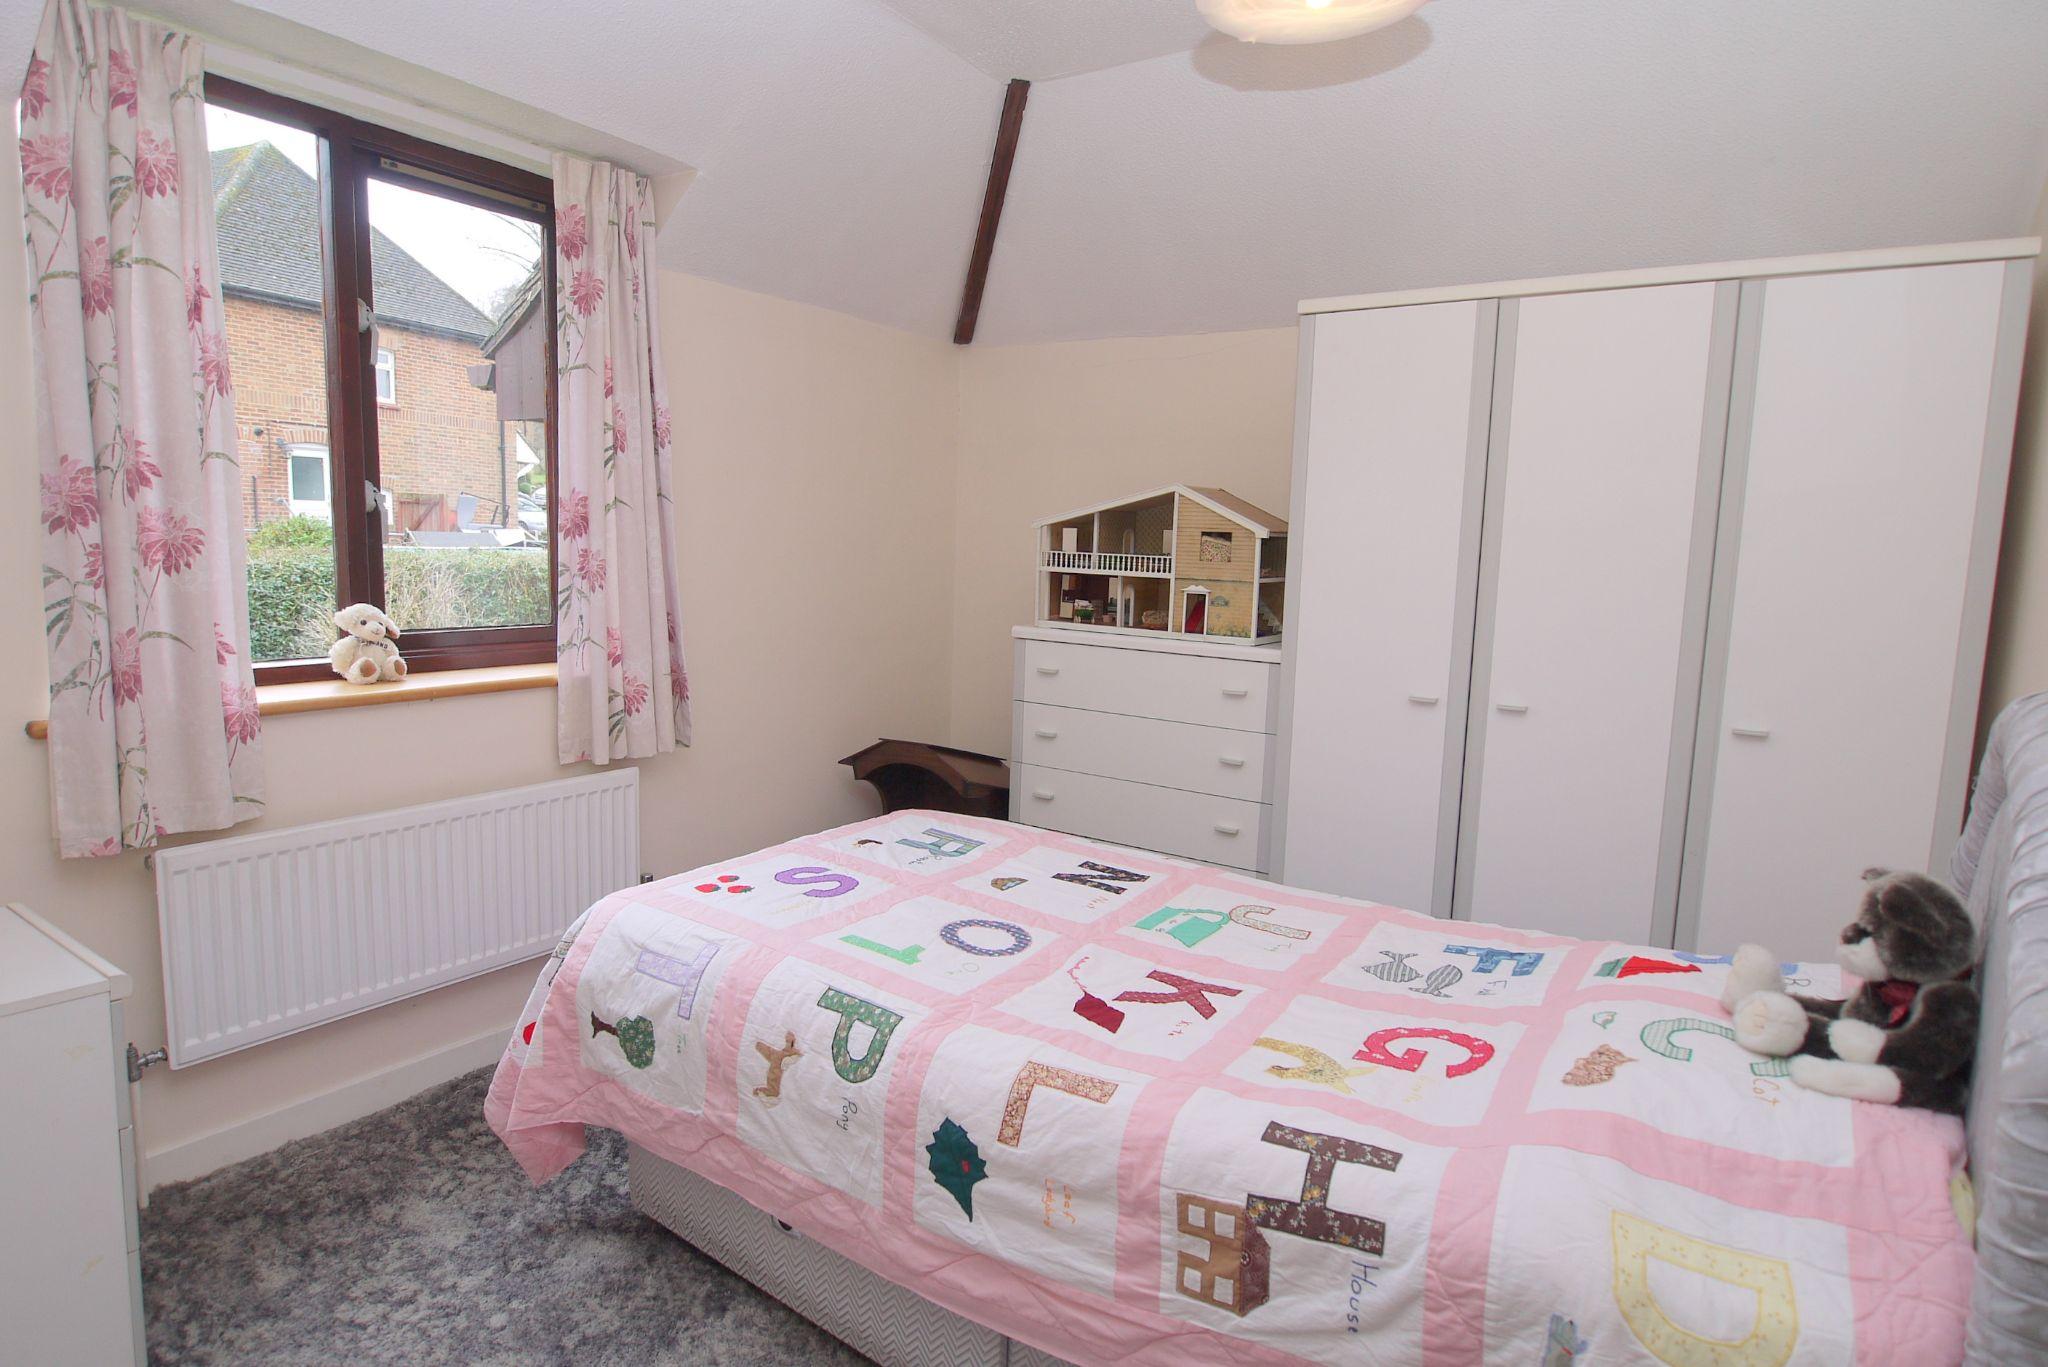 4 bedroom detached house Sold in Sevenoaks - Photograph 10